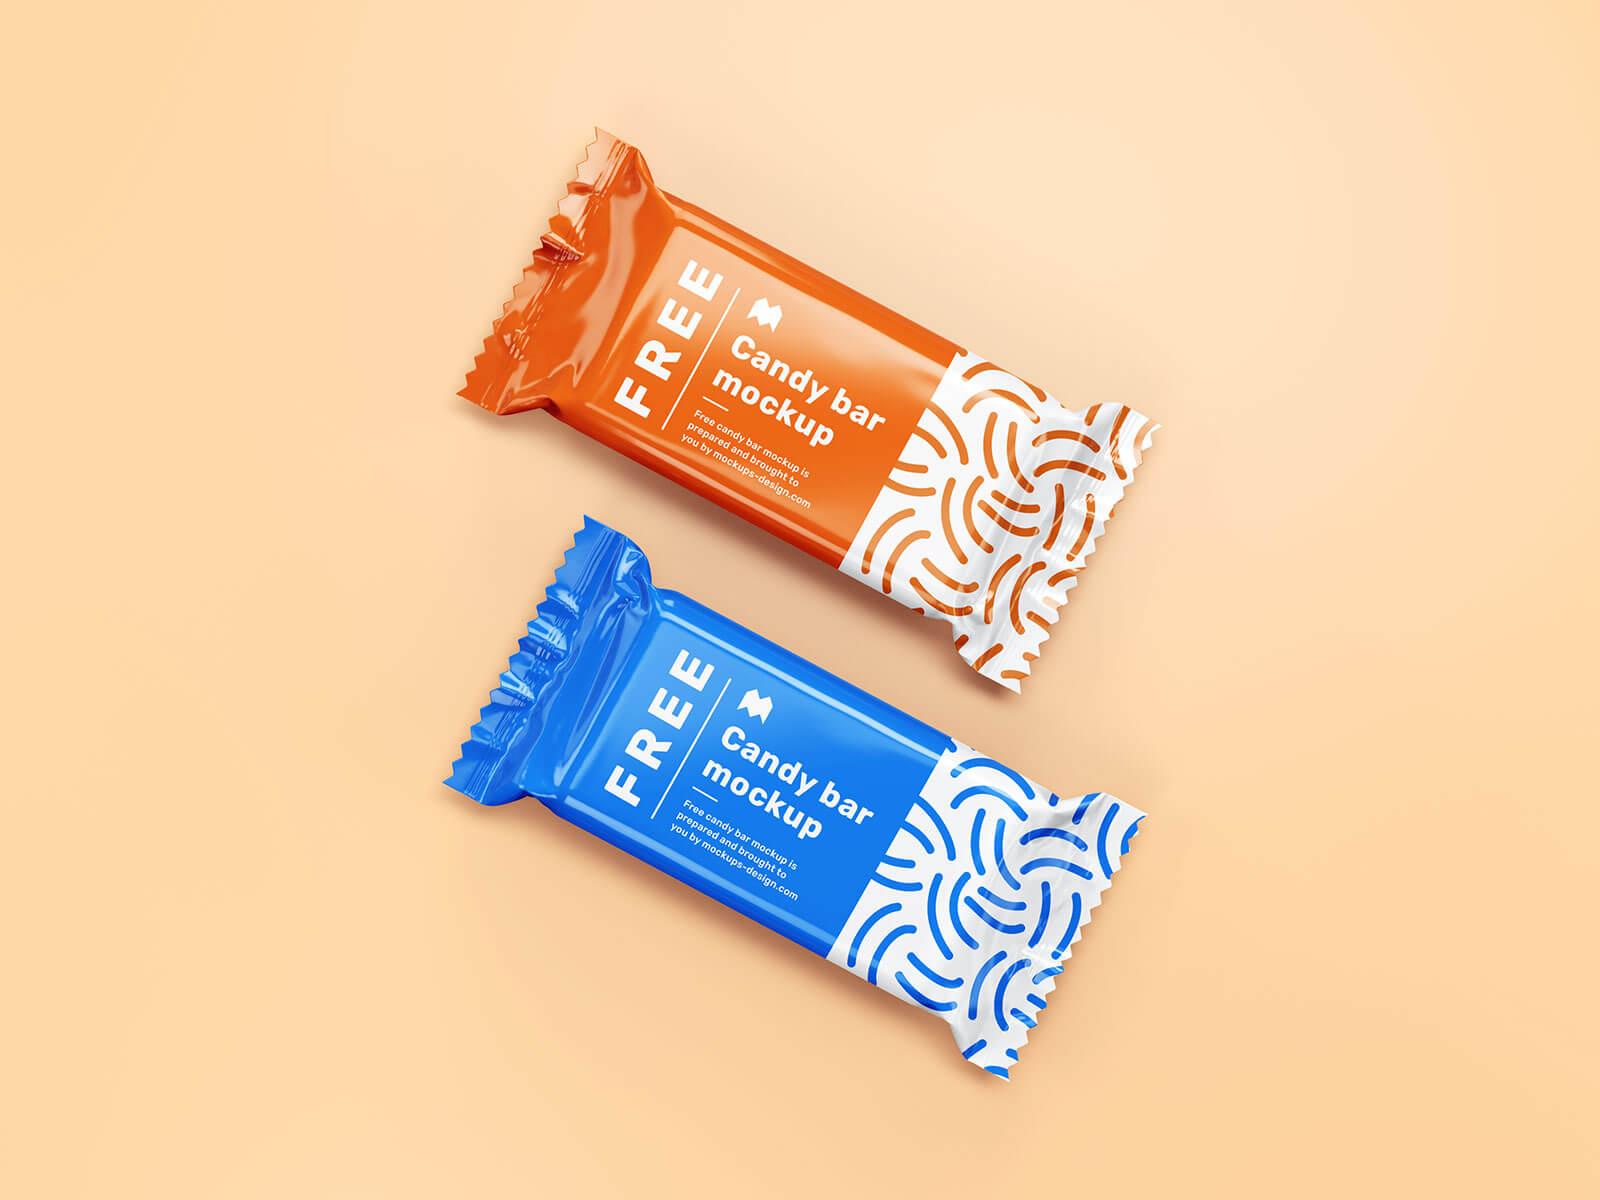 Free Candy / Chocolate Bar Packaging Mockup PSD Set